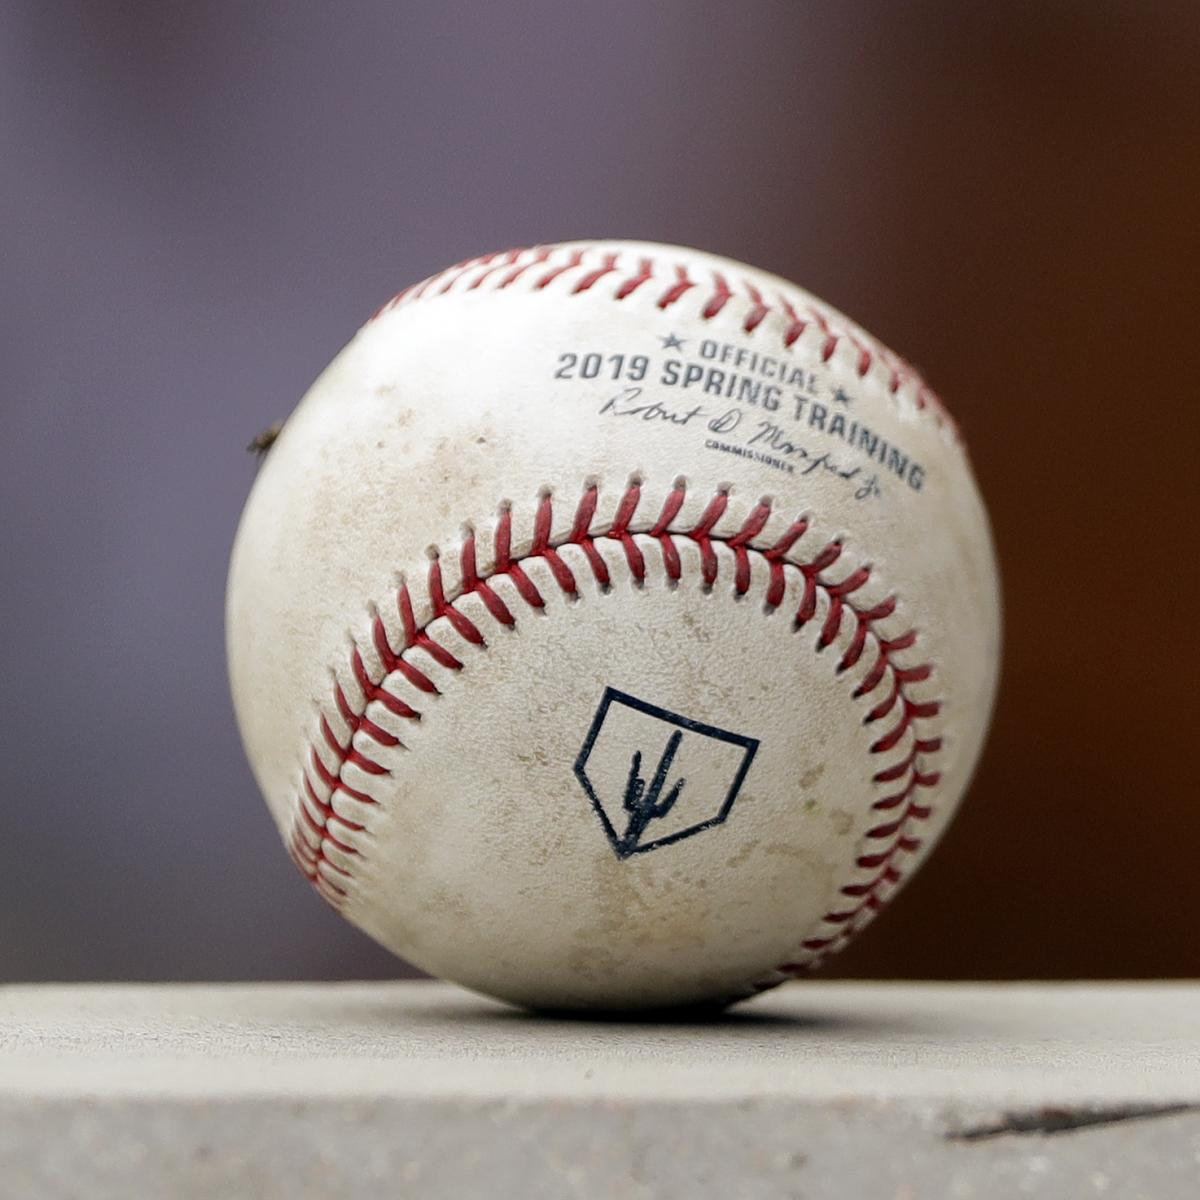 MLB Announces Rule Changes for 2020 Season, Including 3-Batter Minimum for RPs